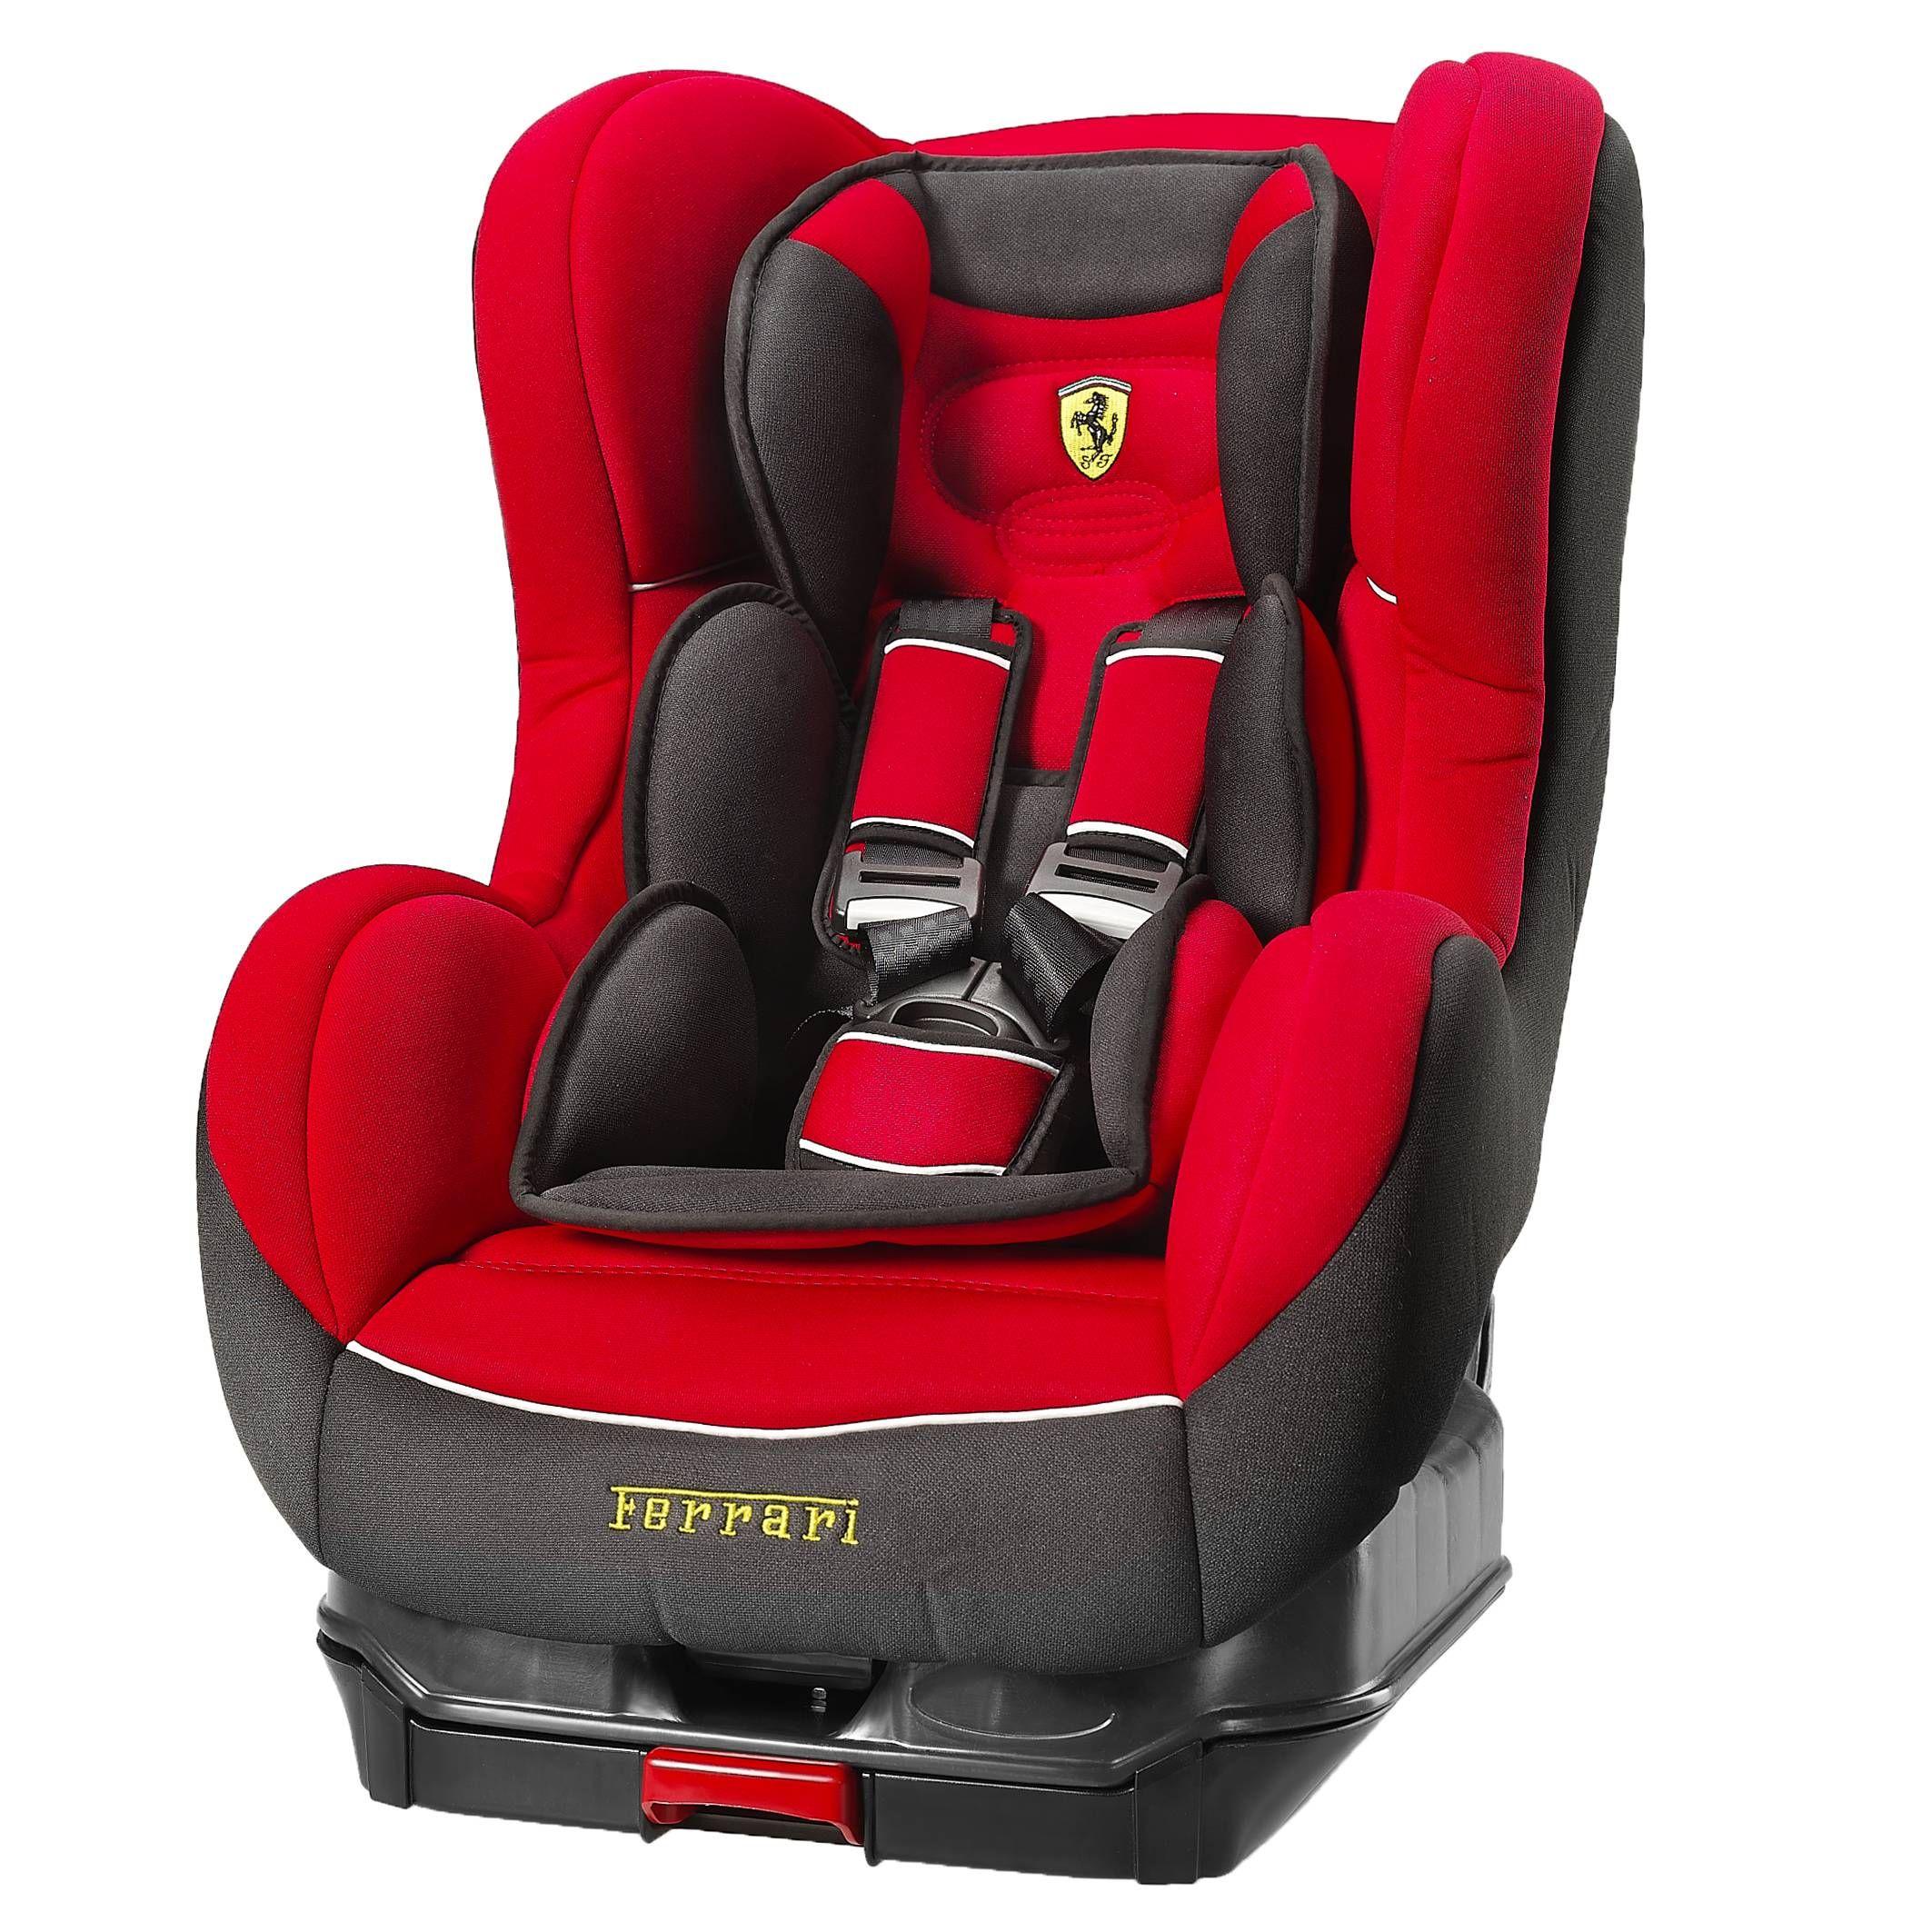 Ferrari Store Baby Seat Cosmo Sp Isofix Ferraristore Ferrari Set Seat Baby Baby Seat Baby Car Bed Baby Car Seats